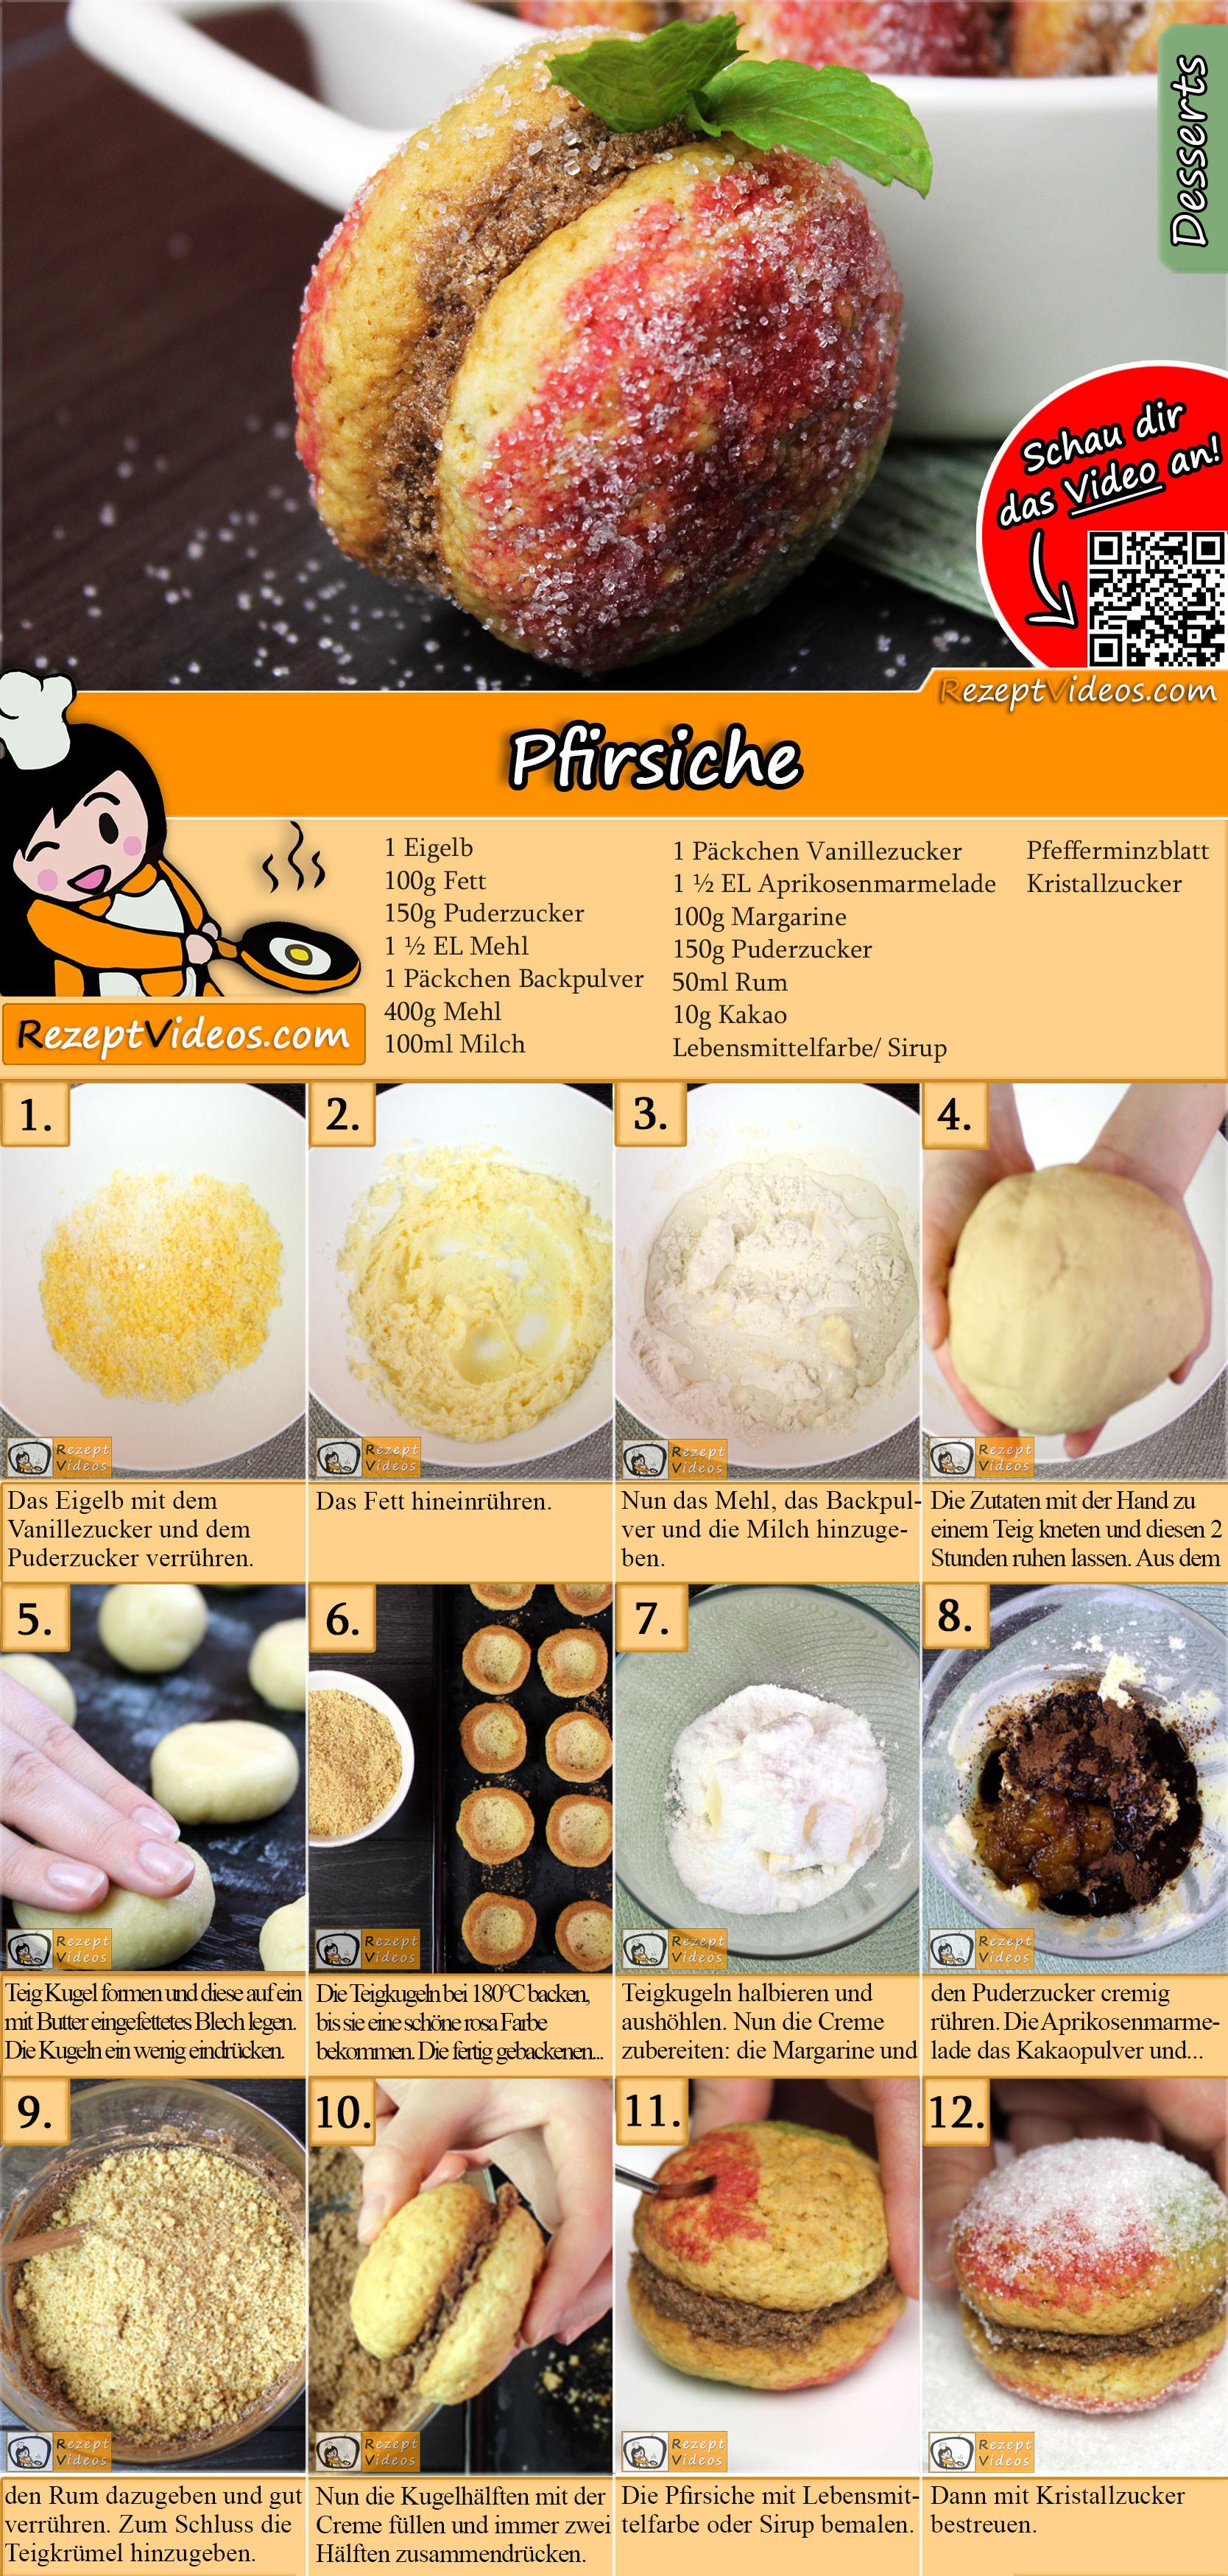 Pfirsiche Rezept mit Video